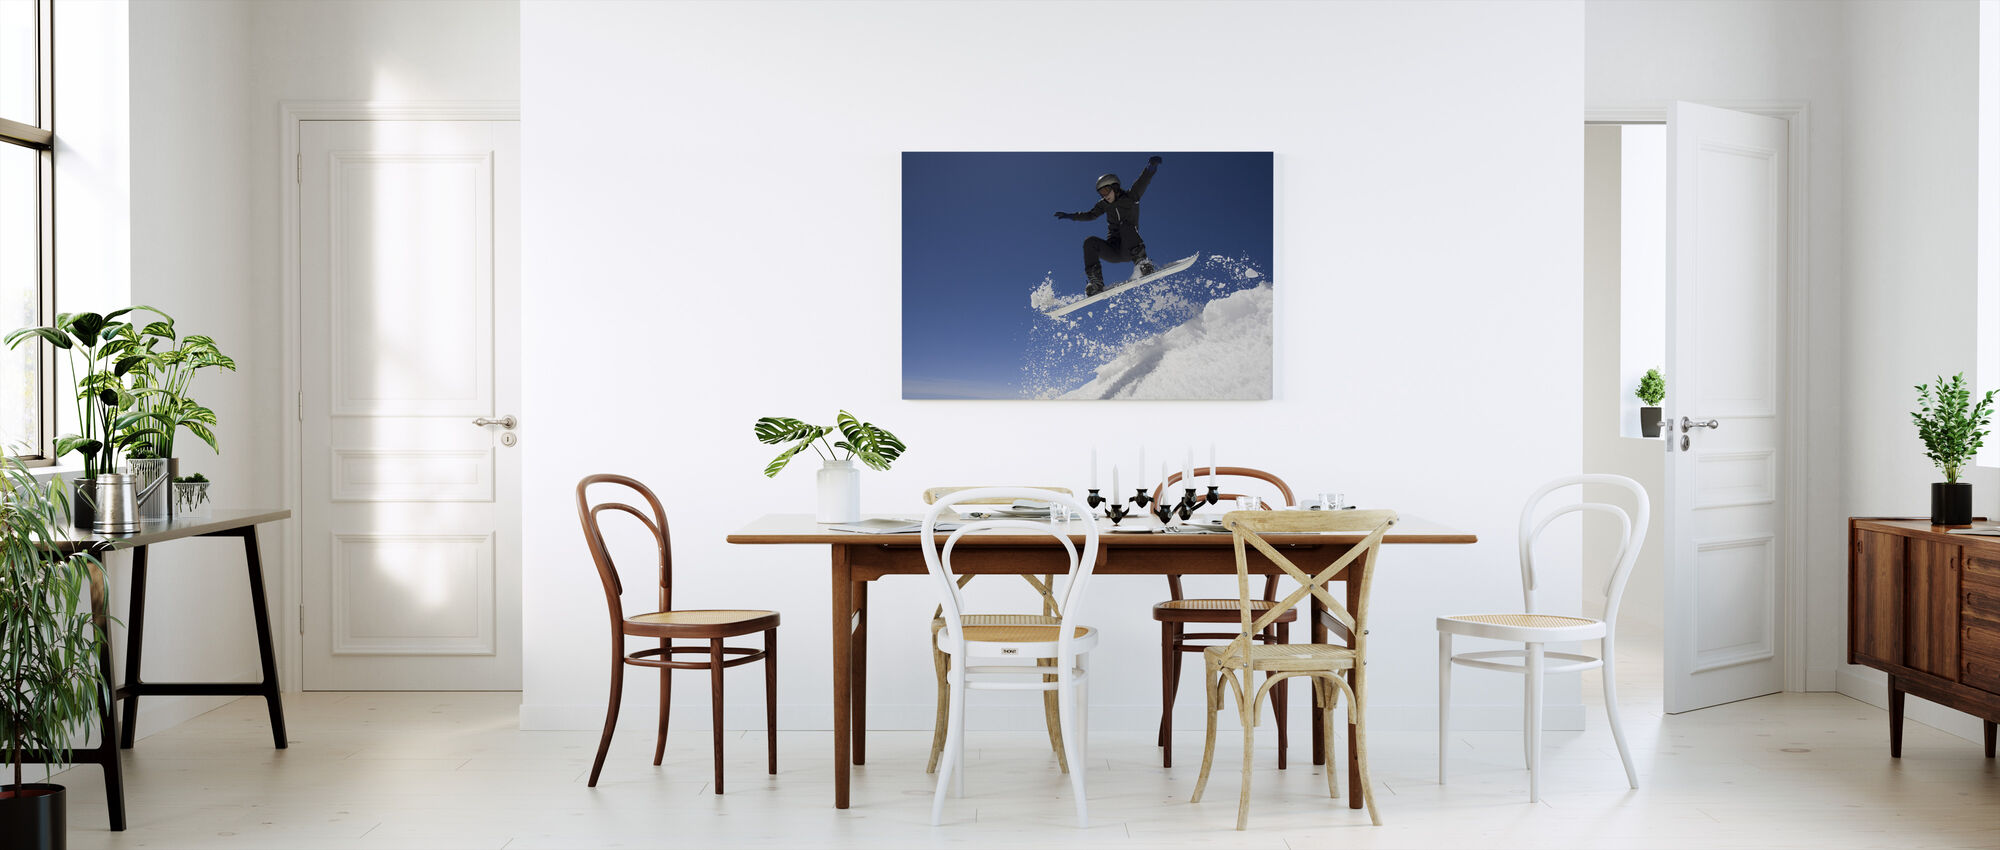 Snowboarder Jumping through Air - Canvas print - Kitchen